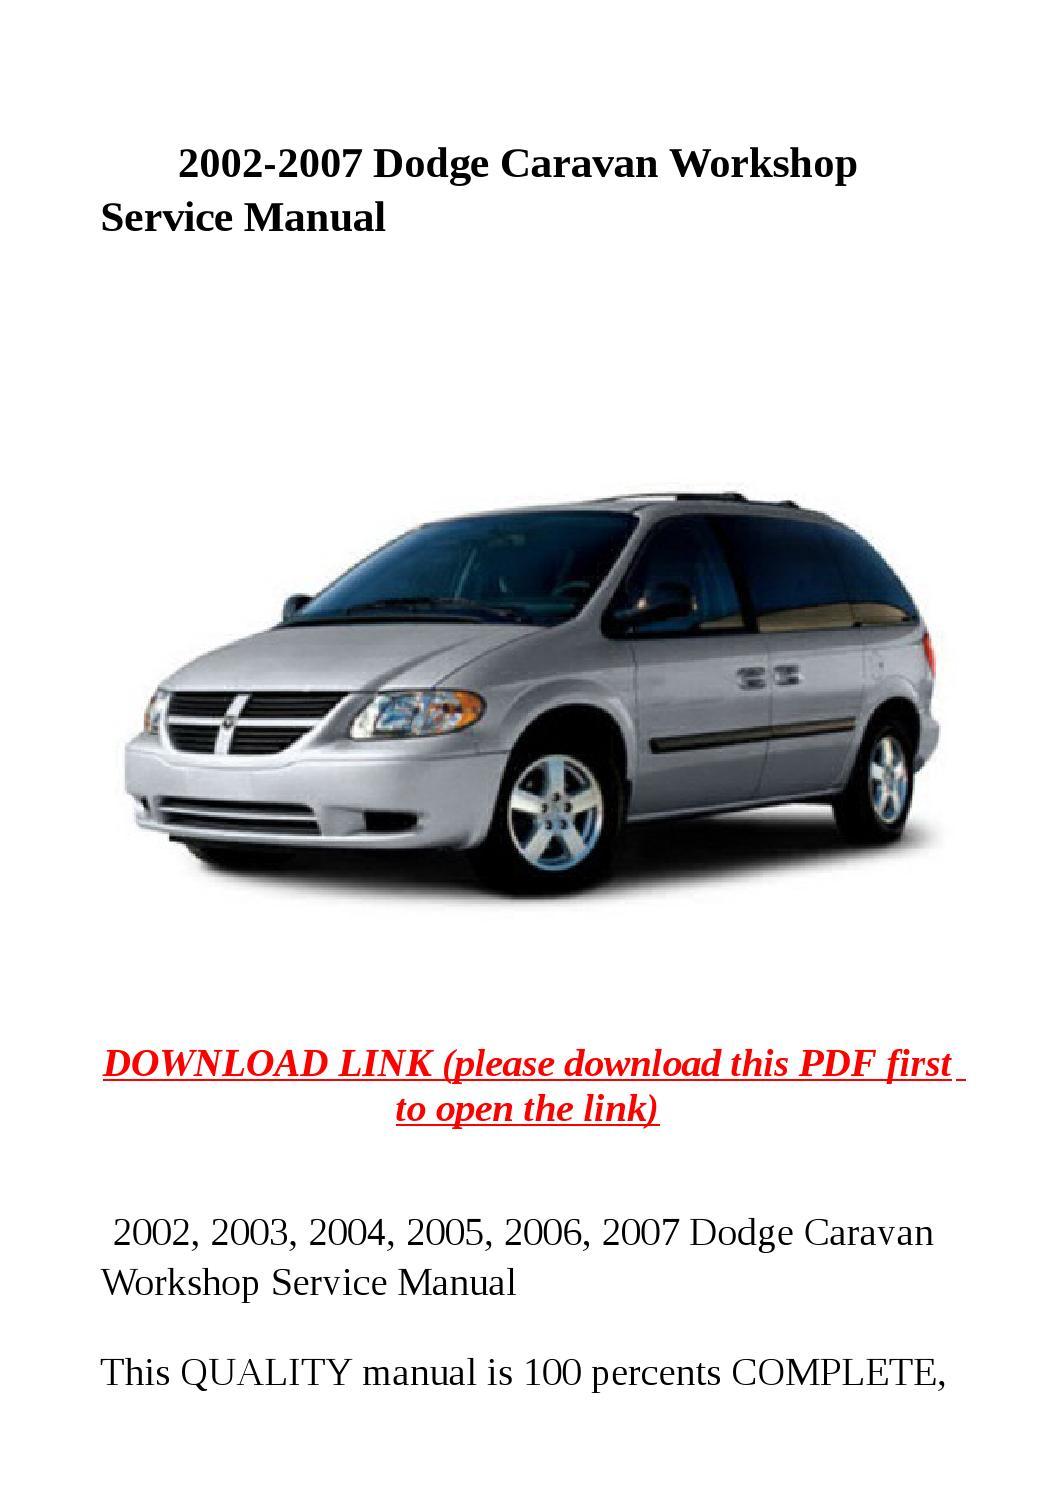 2002 2007 Dodge Caravan Workshop Service Manual By Sally